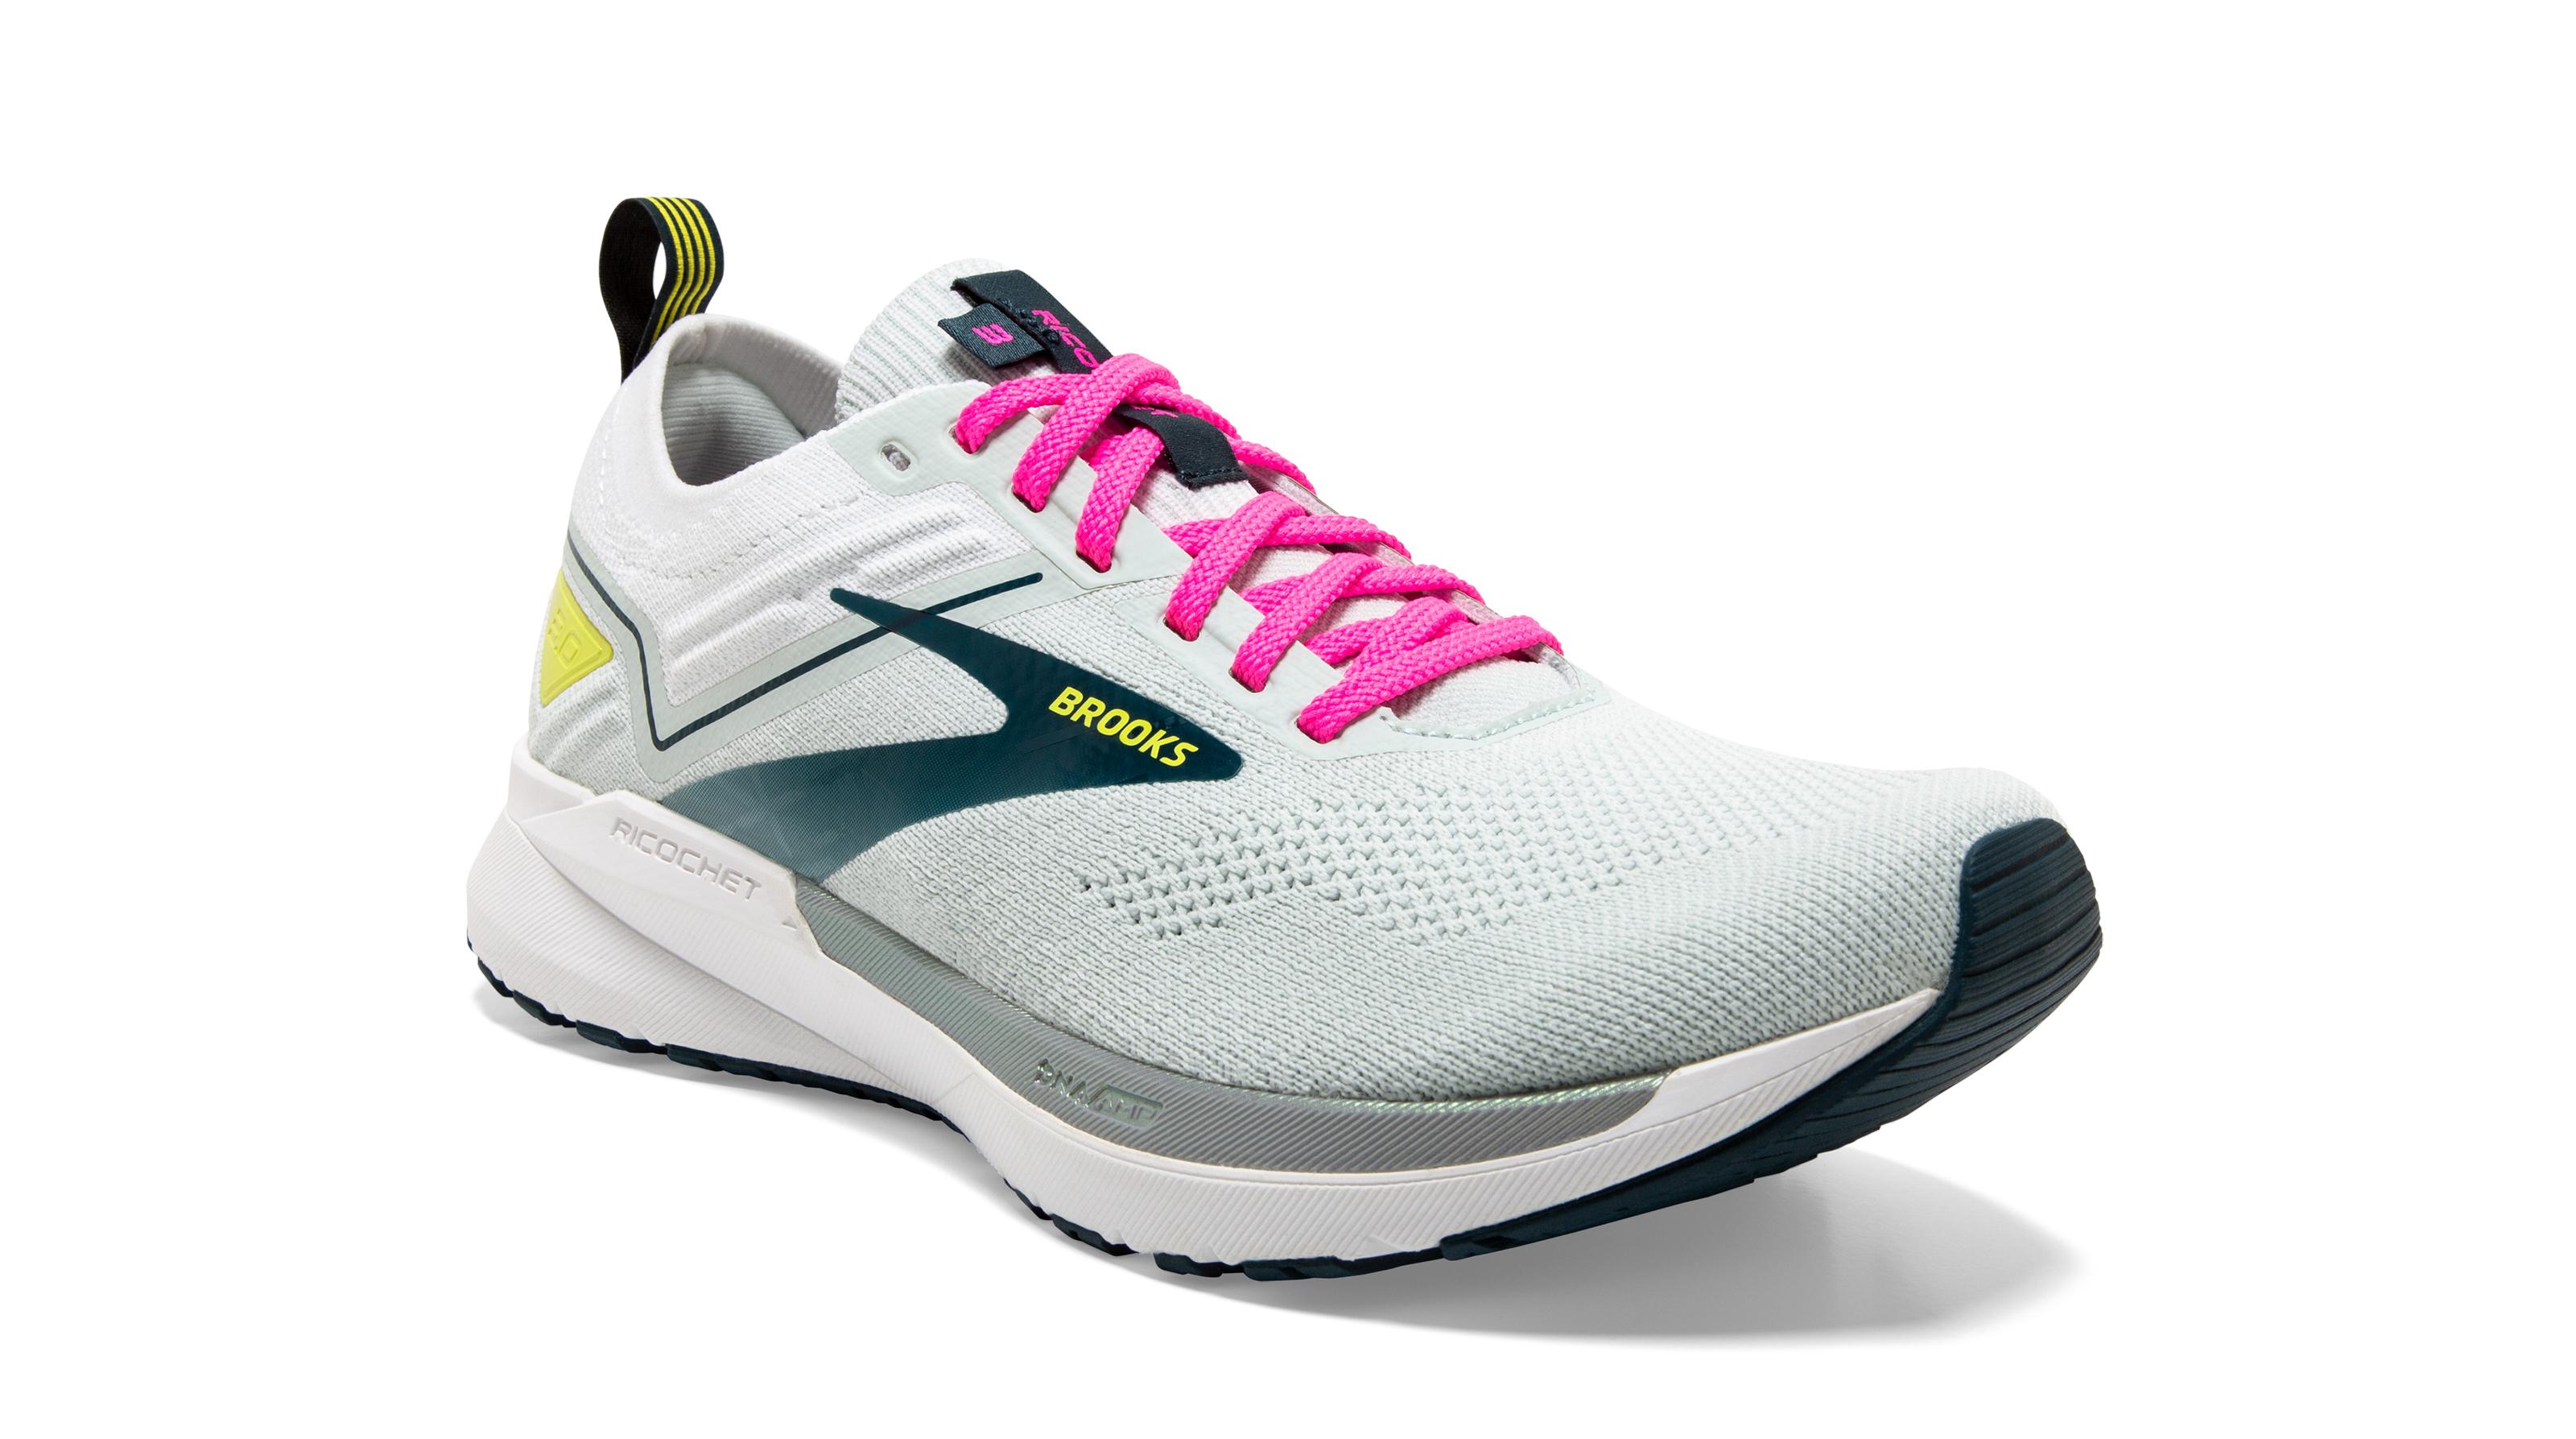 Brooks Ricochet 3 Women's Road Running Shoes